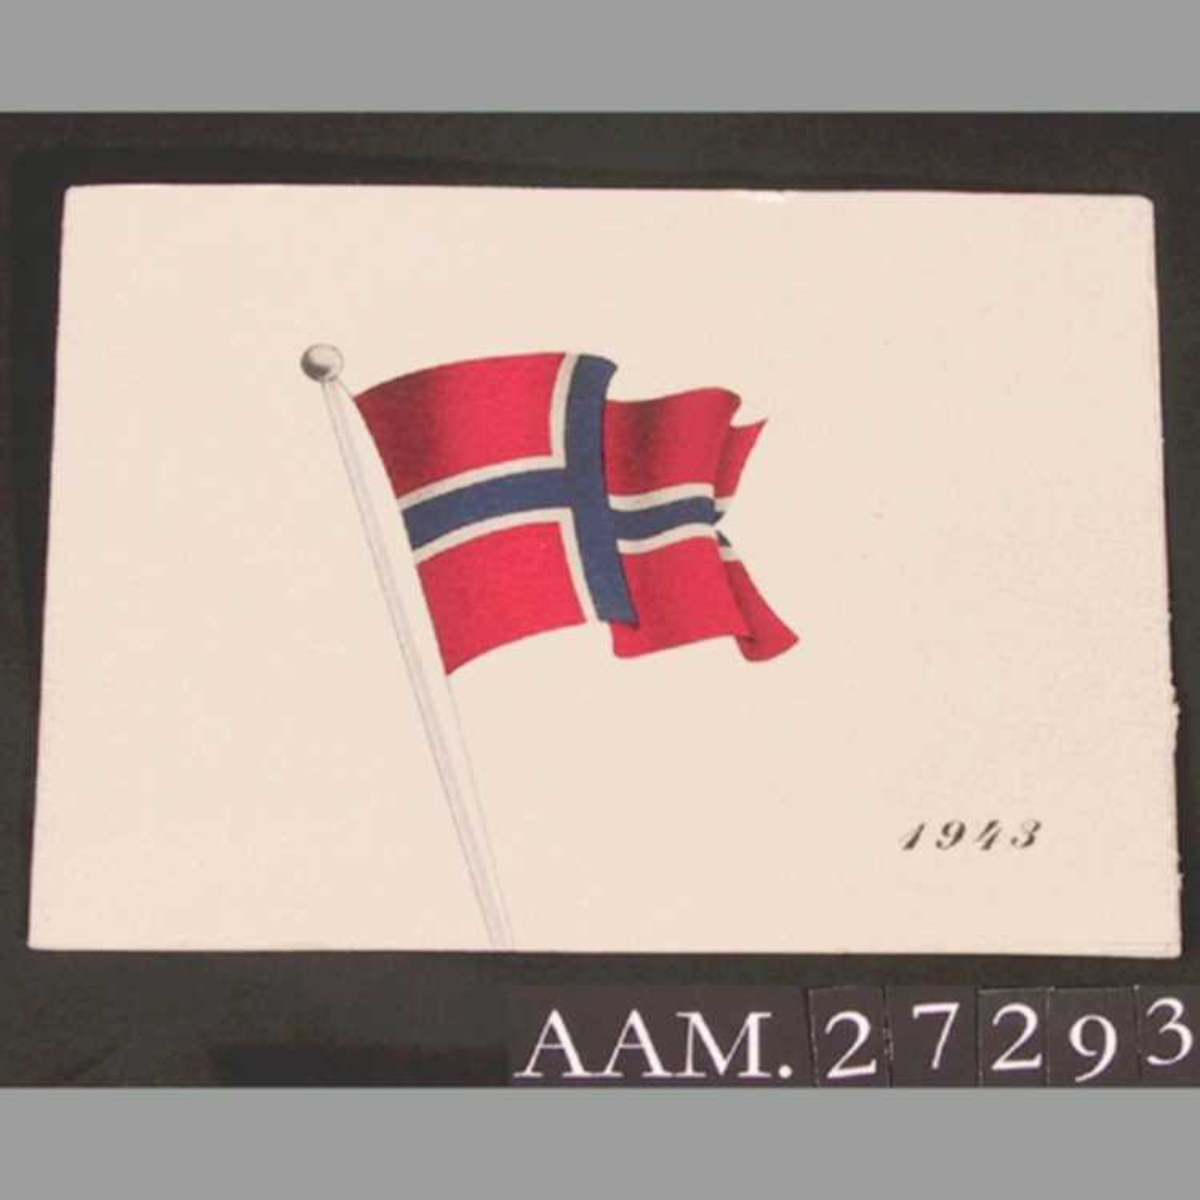 Norsk flagg på forsiden, kronprinsesse Märthas monogram